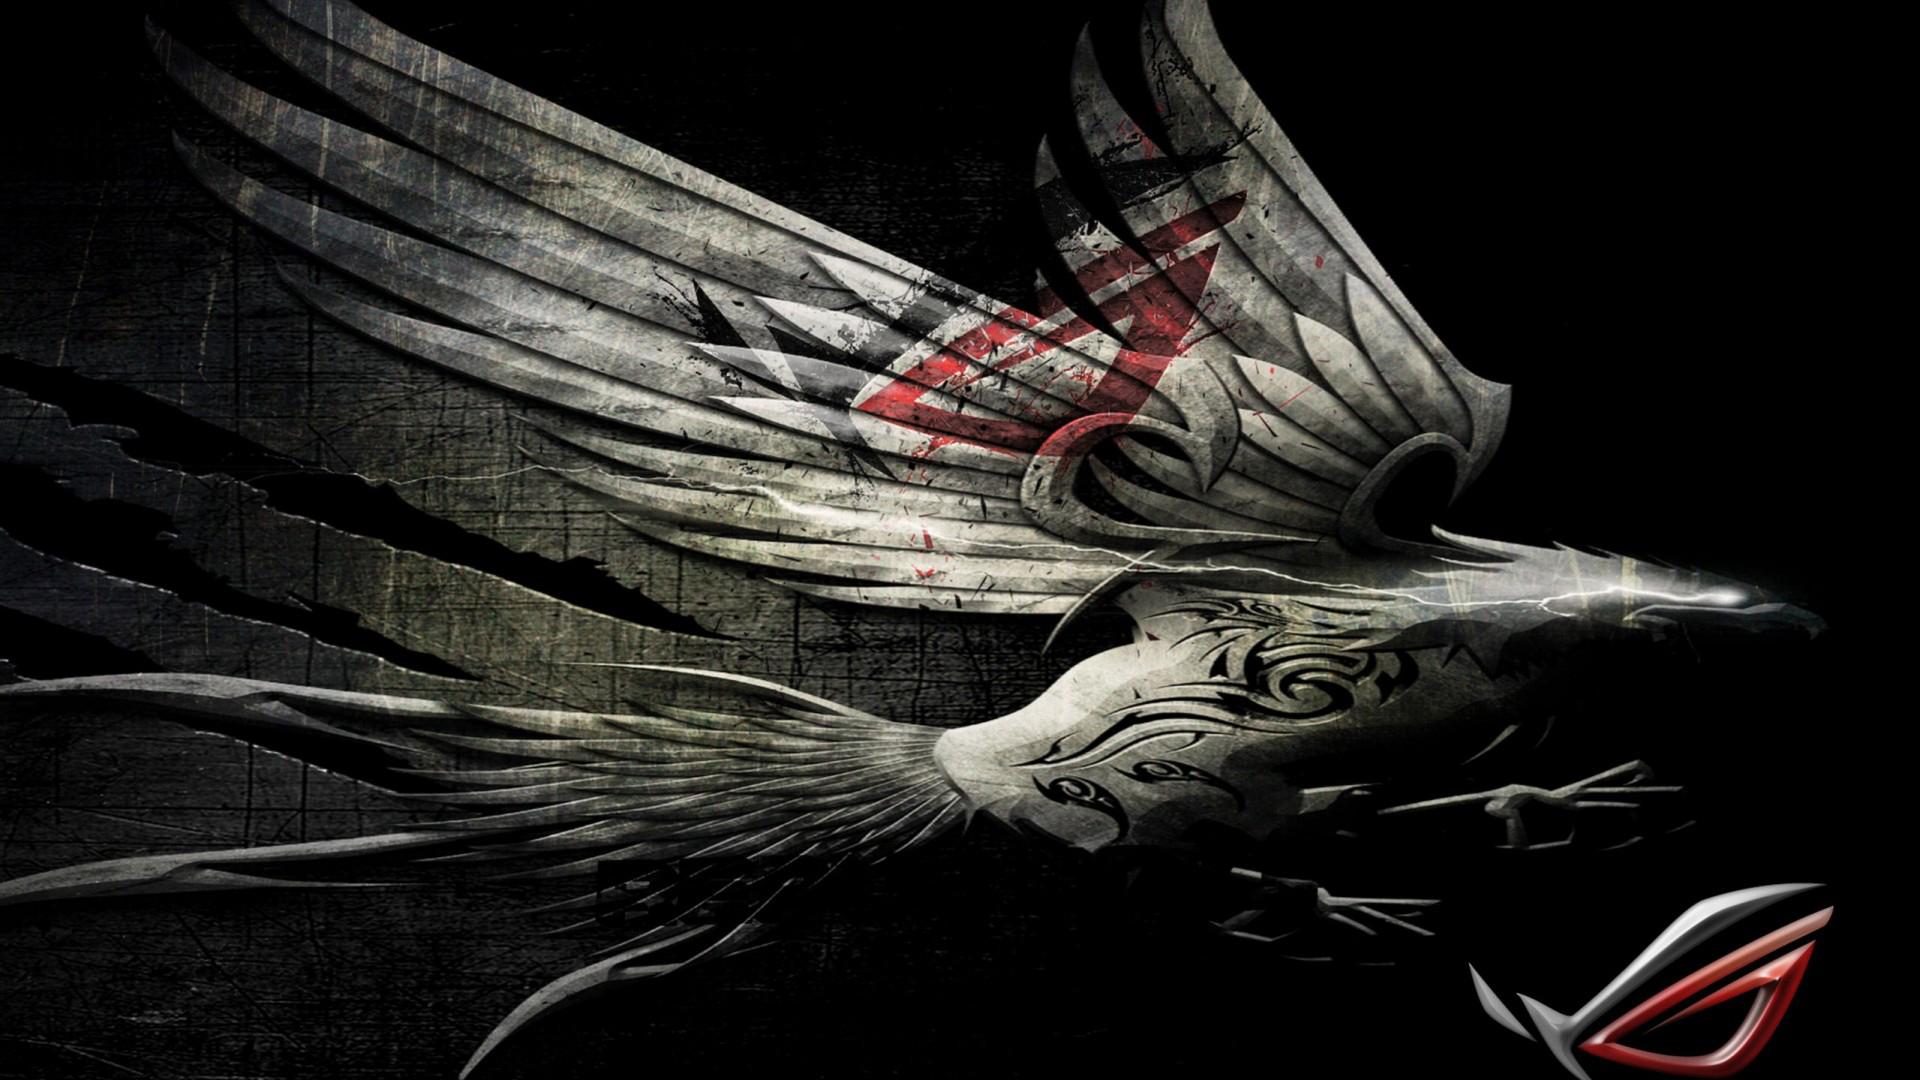 Asus Rog Revelation Logo HD Wallpaper